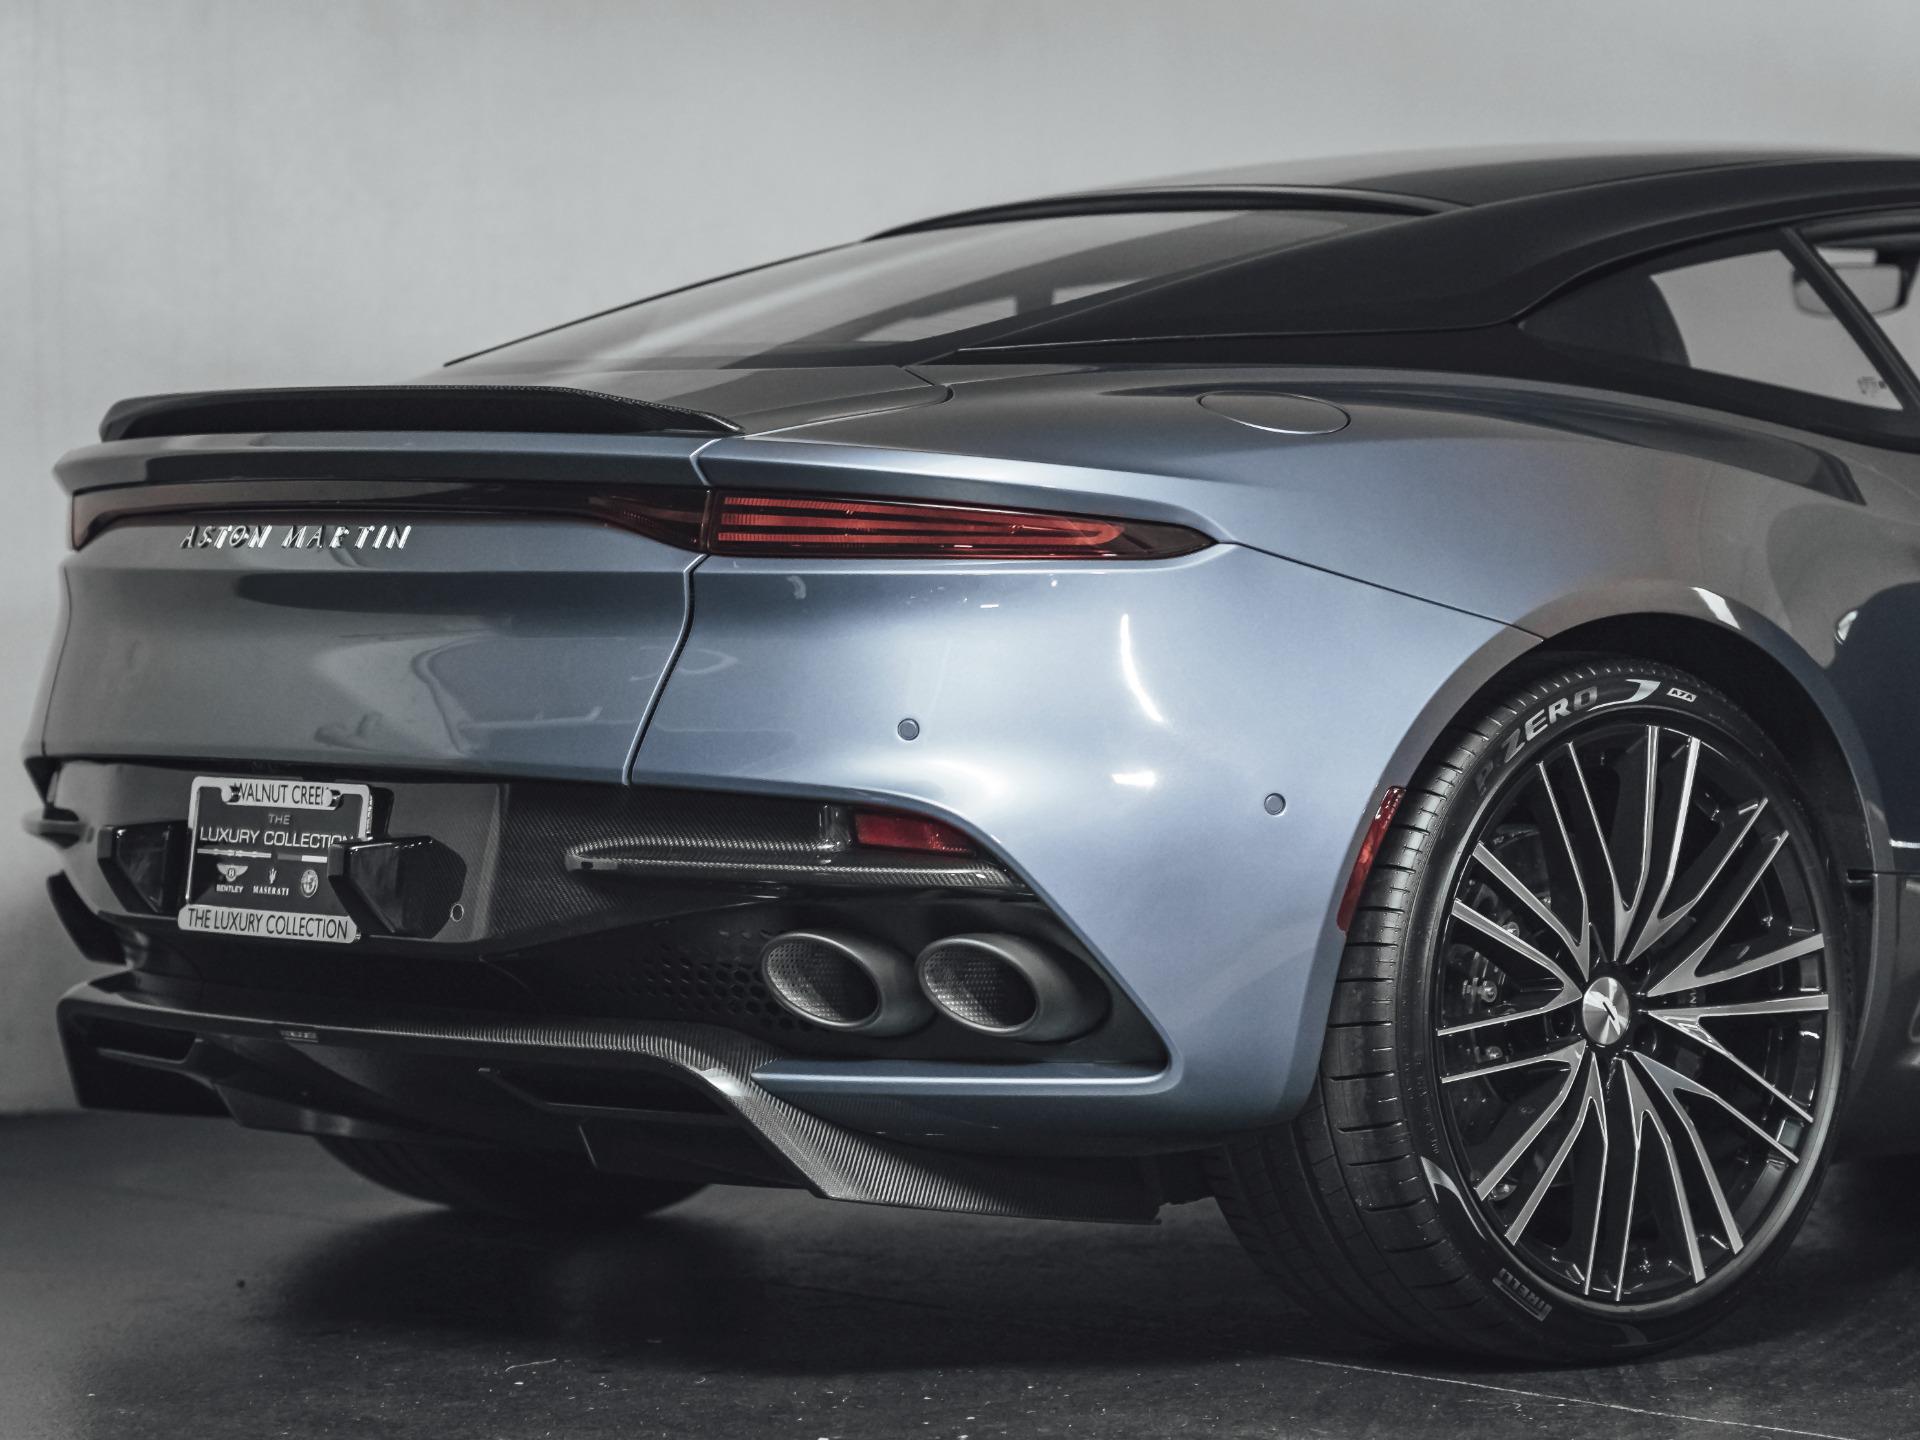 New 2020 Aston Martin Dbs Superleggera For Sale Sold The Luxury Collection Walnut Creek Stock Aml045